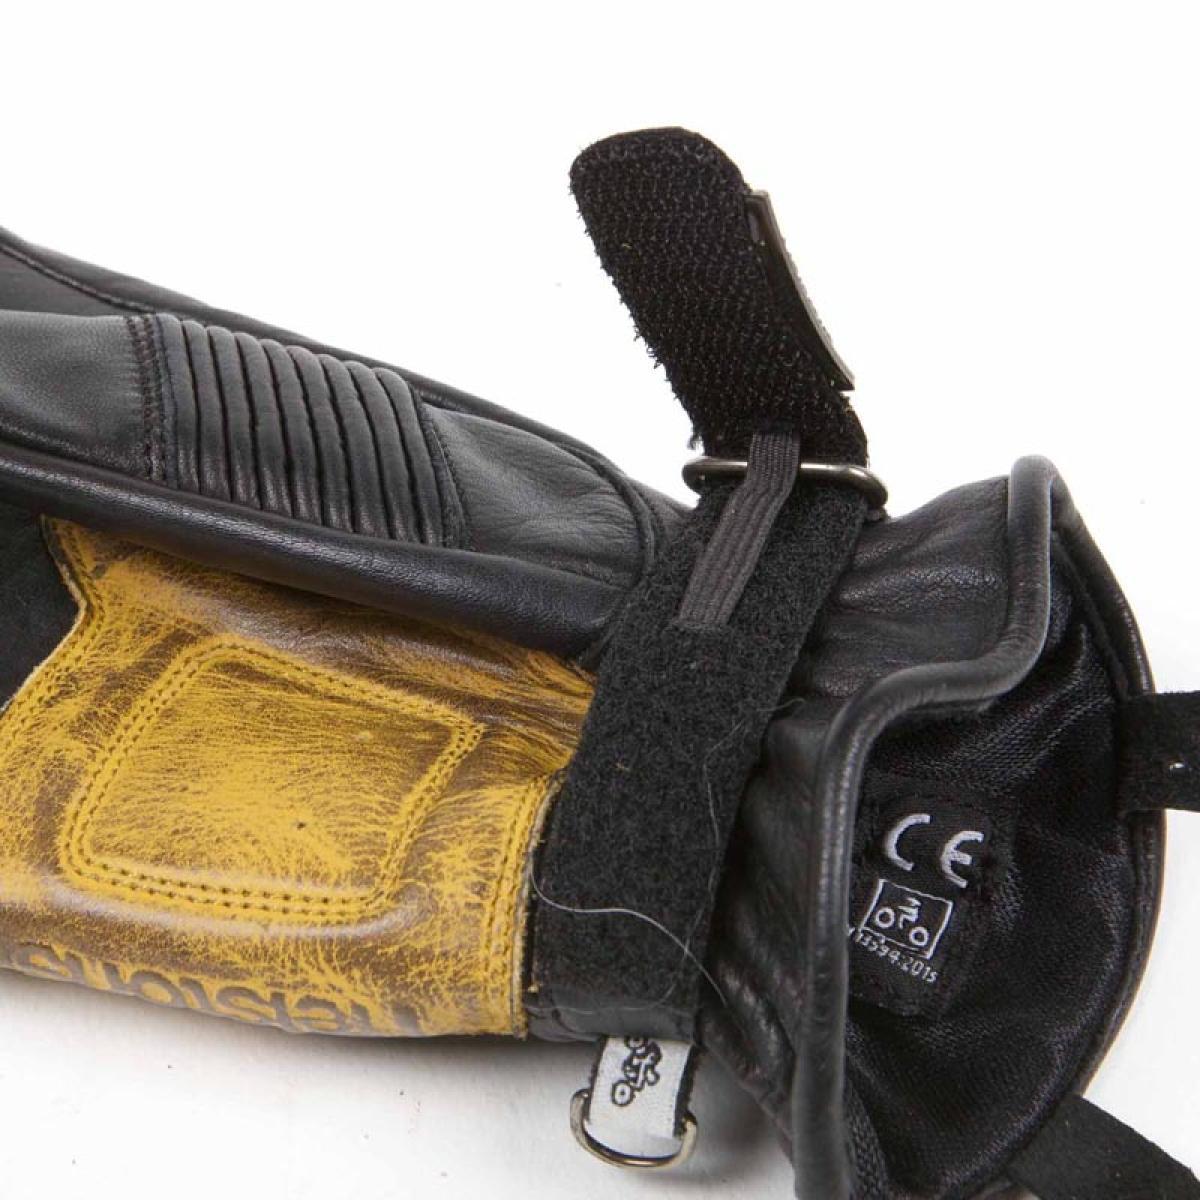 gants moto ete homme cuir helston 39 s velvet noir or. Black Bedroom Furniture Sets. Home Design Ideas